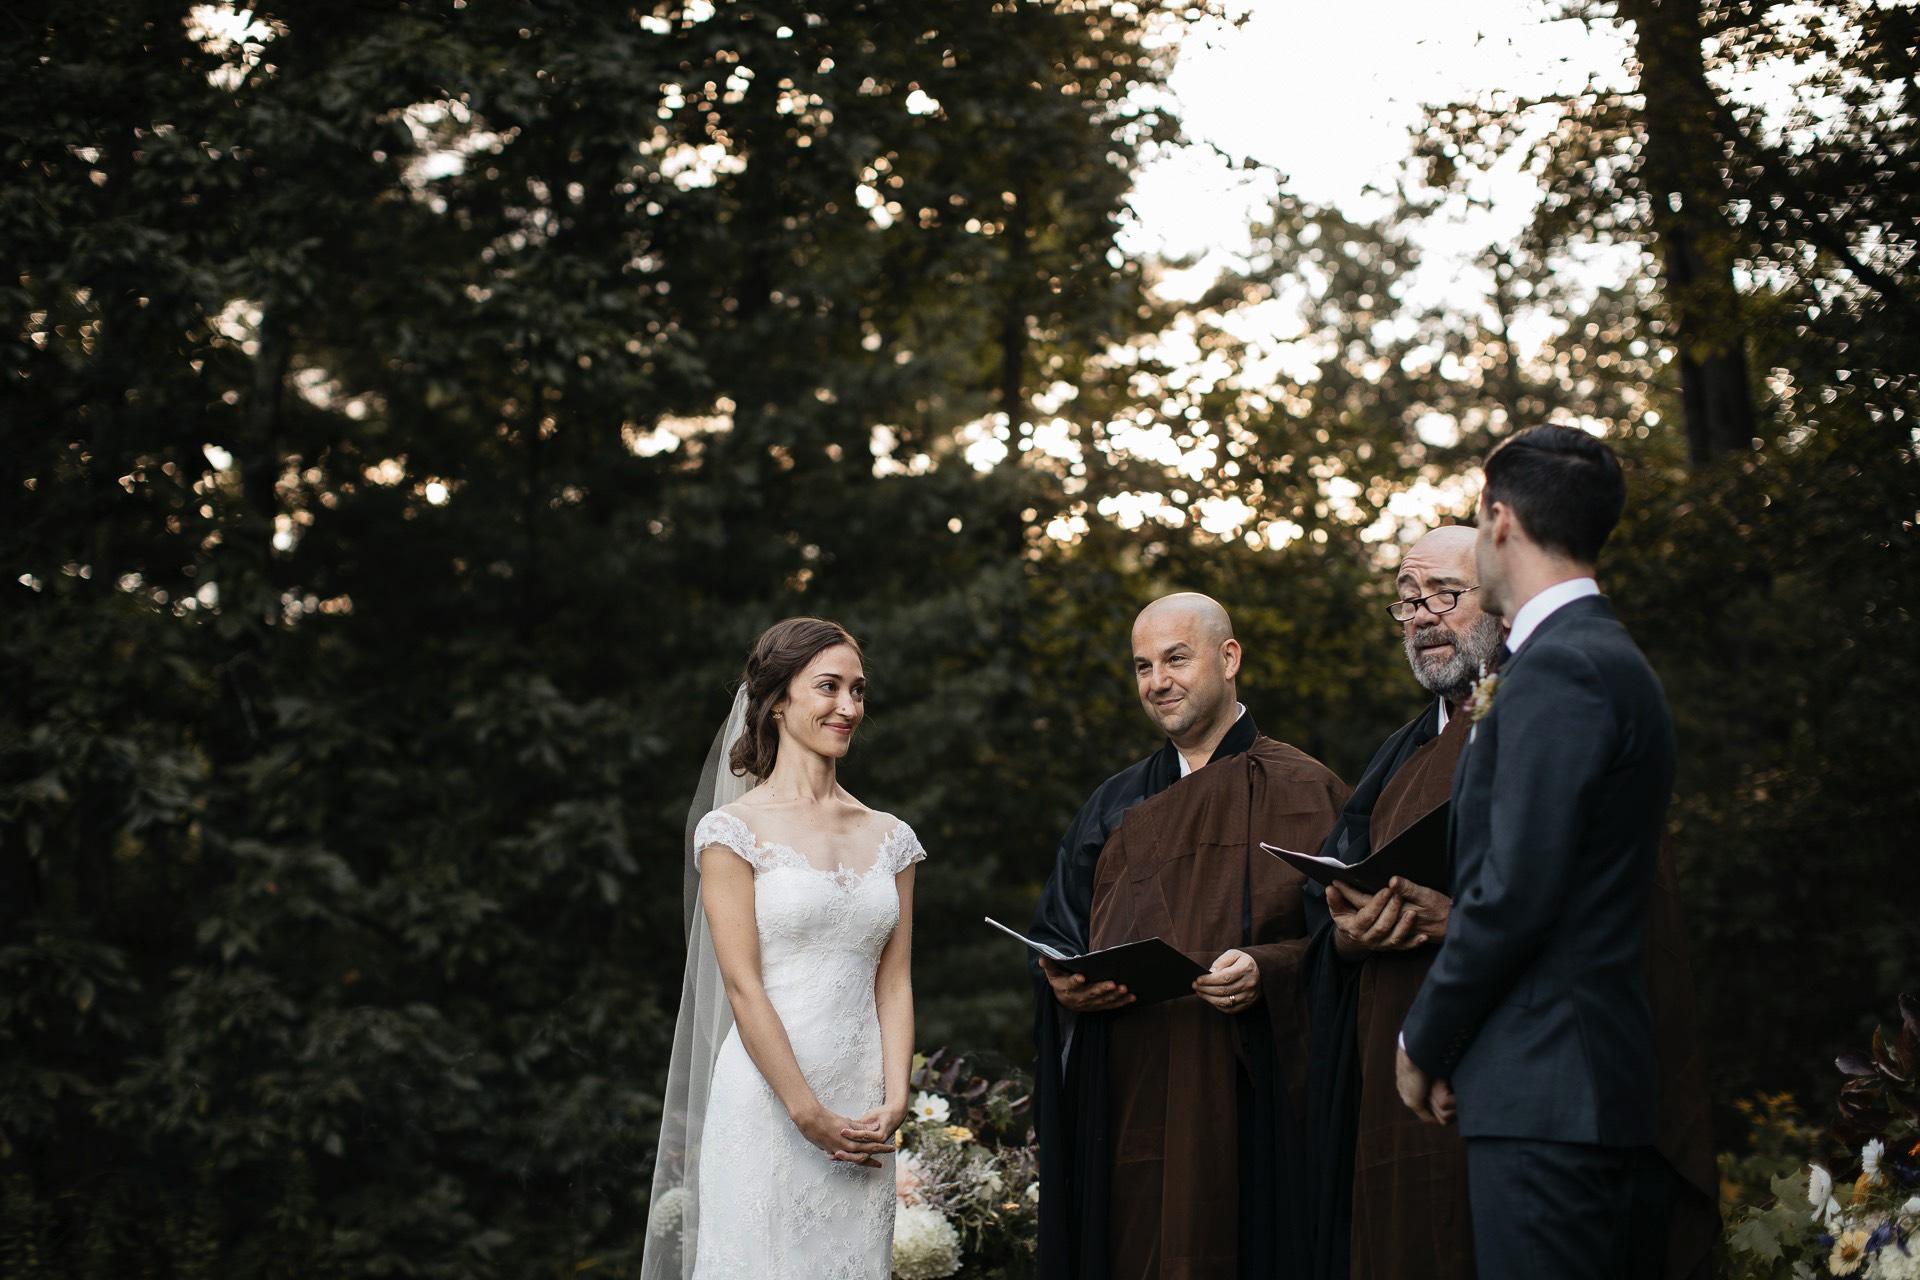 Isabel & Robbie Romantic Catskills Wedding in mount Tremper by Jean-Laurent Gaudy